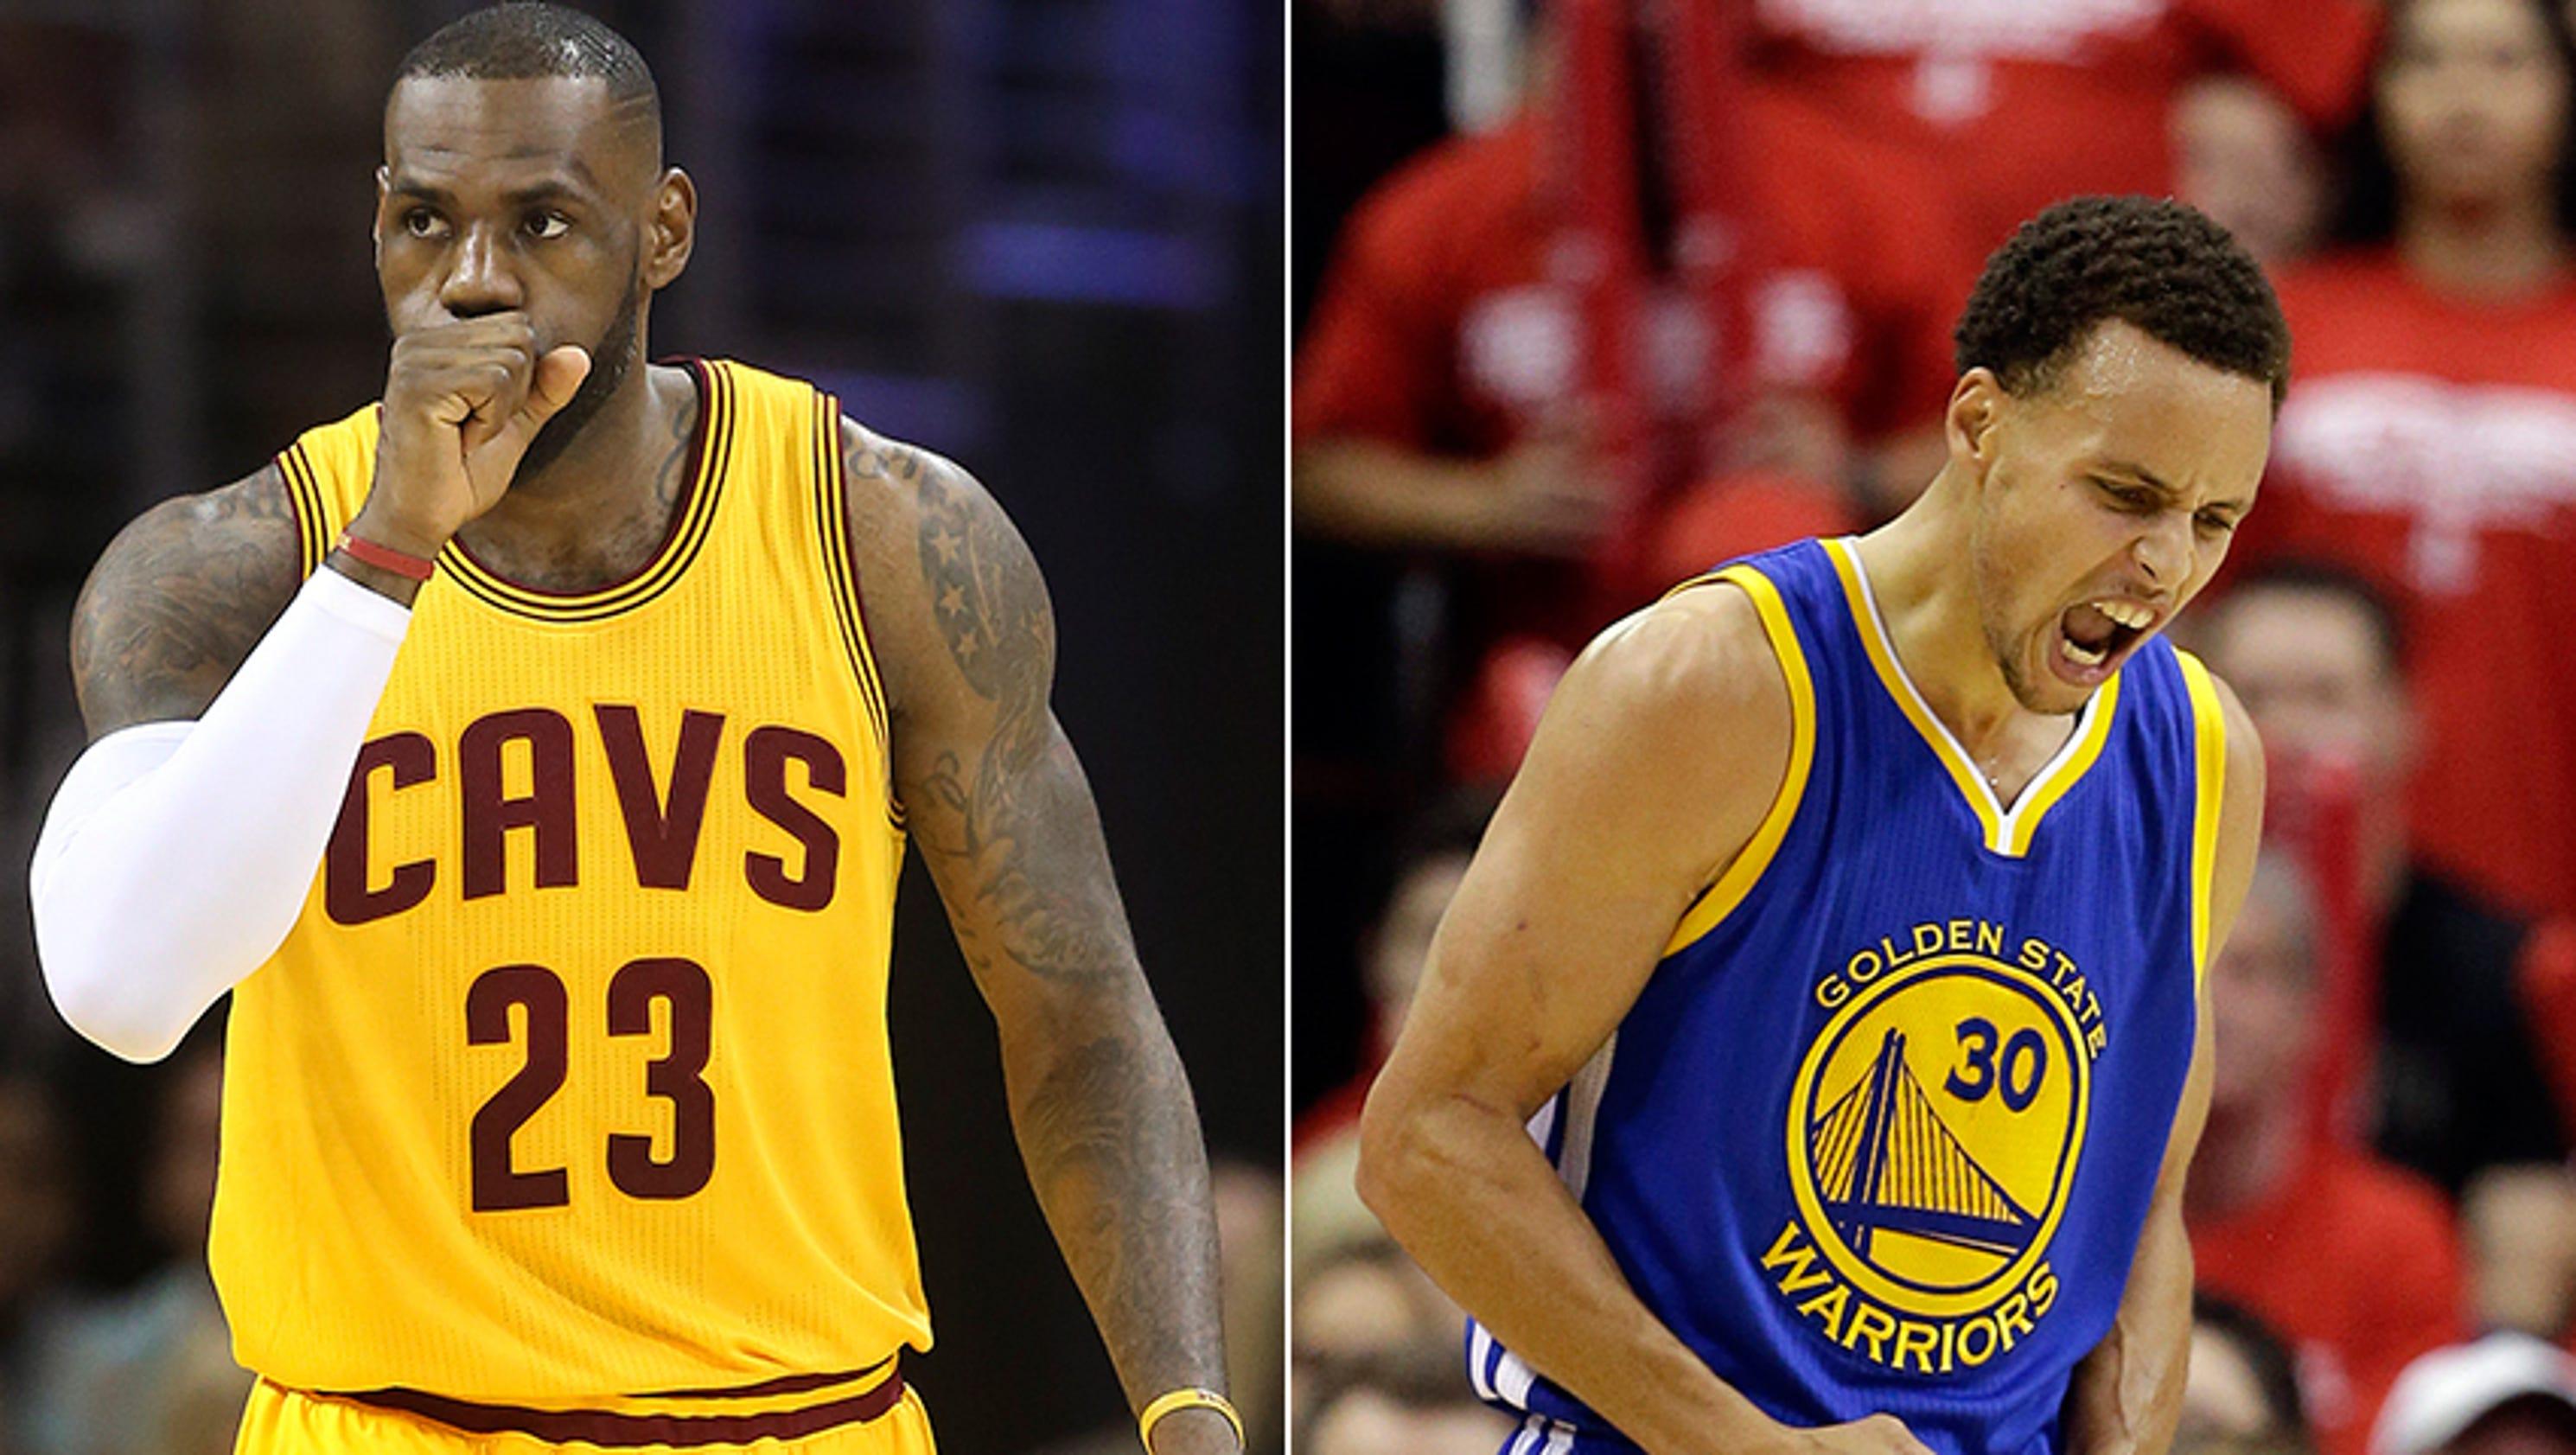 LeBron vs. Curry best since Magic vs. Bird?